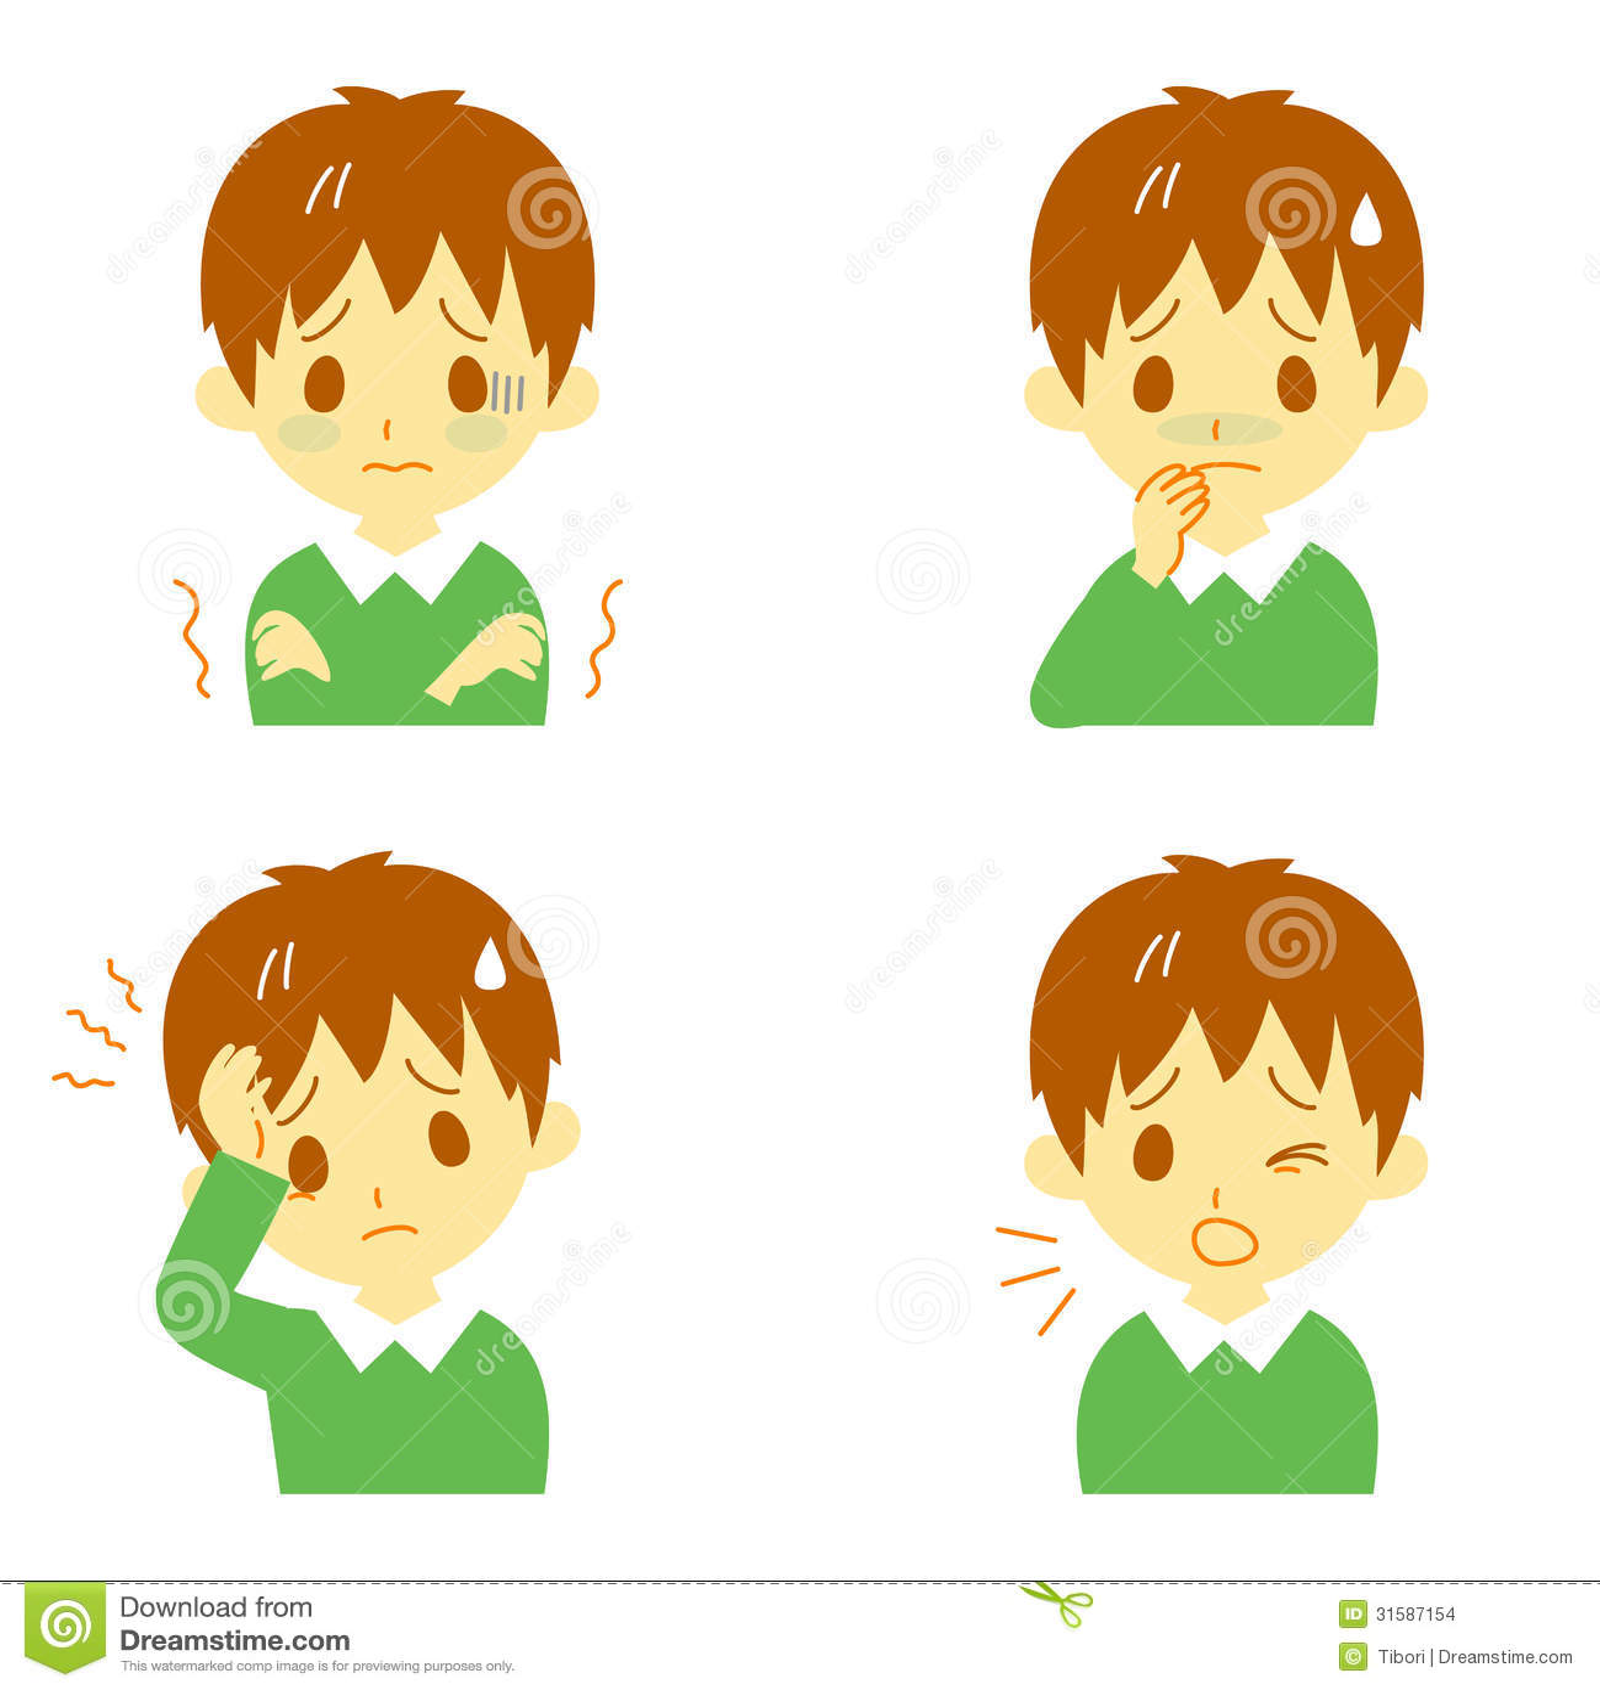 fever migraine nausea are symptoms of what